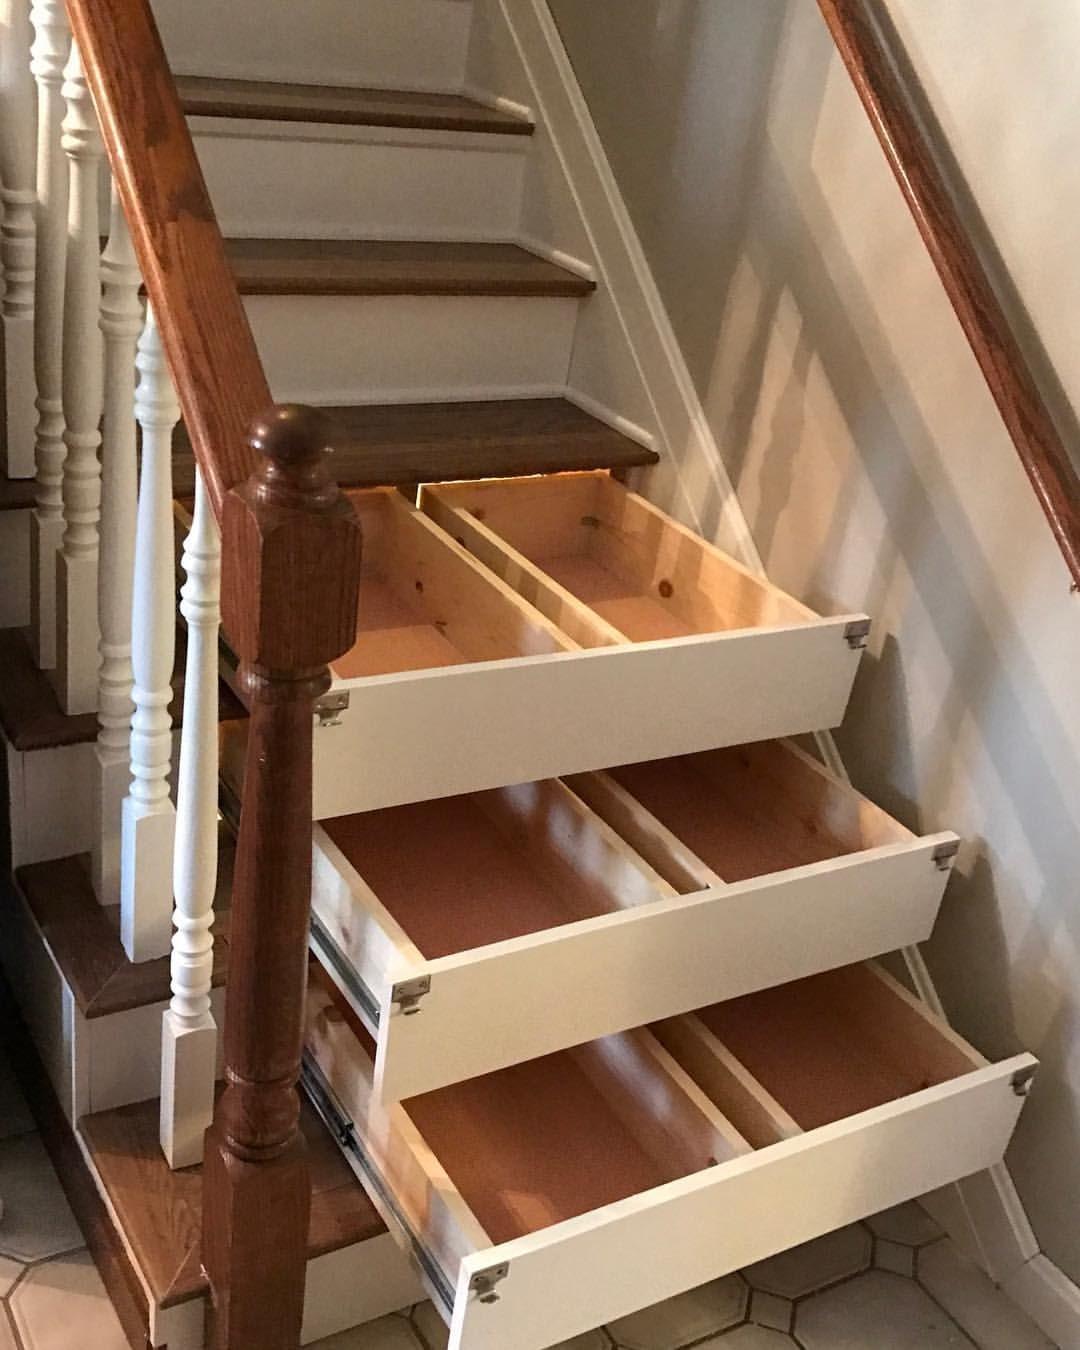 Pin By Mackenzie Jones On Home Irl Stair Storage Staircase